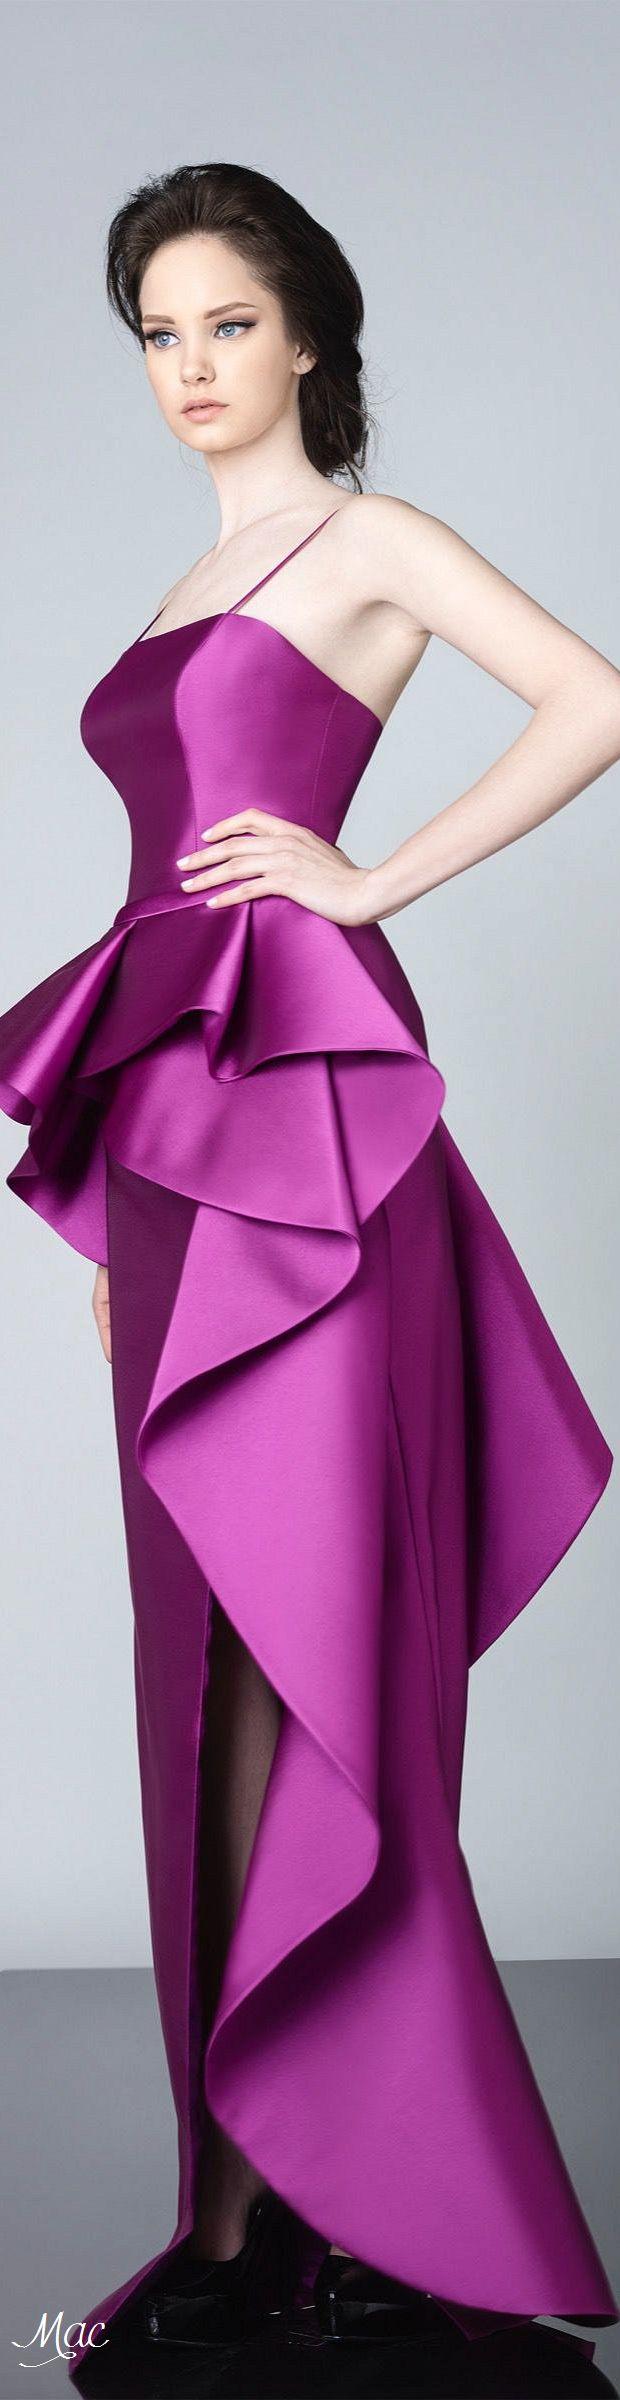 374 best FASHION DRESSES images on Pinterest | Short wedding gowns ...